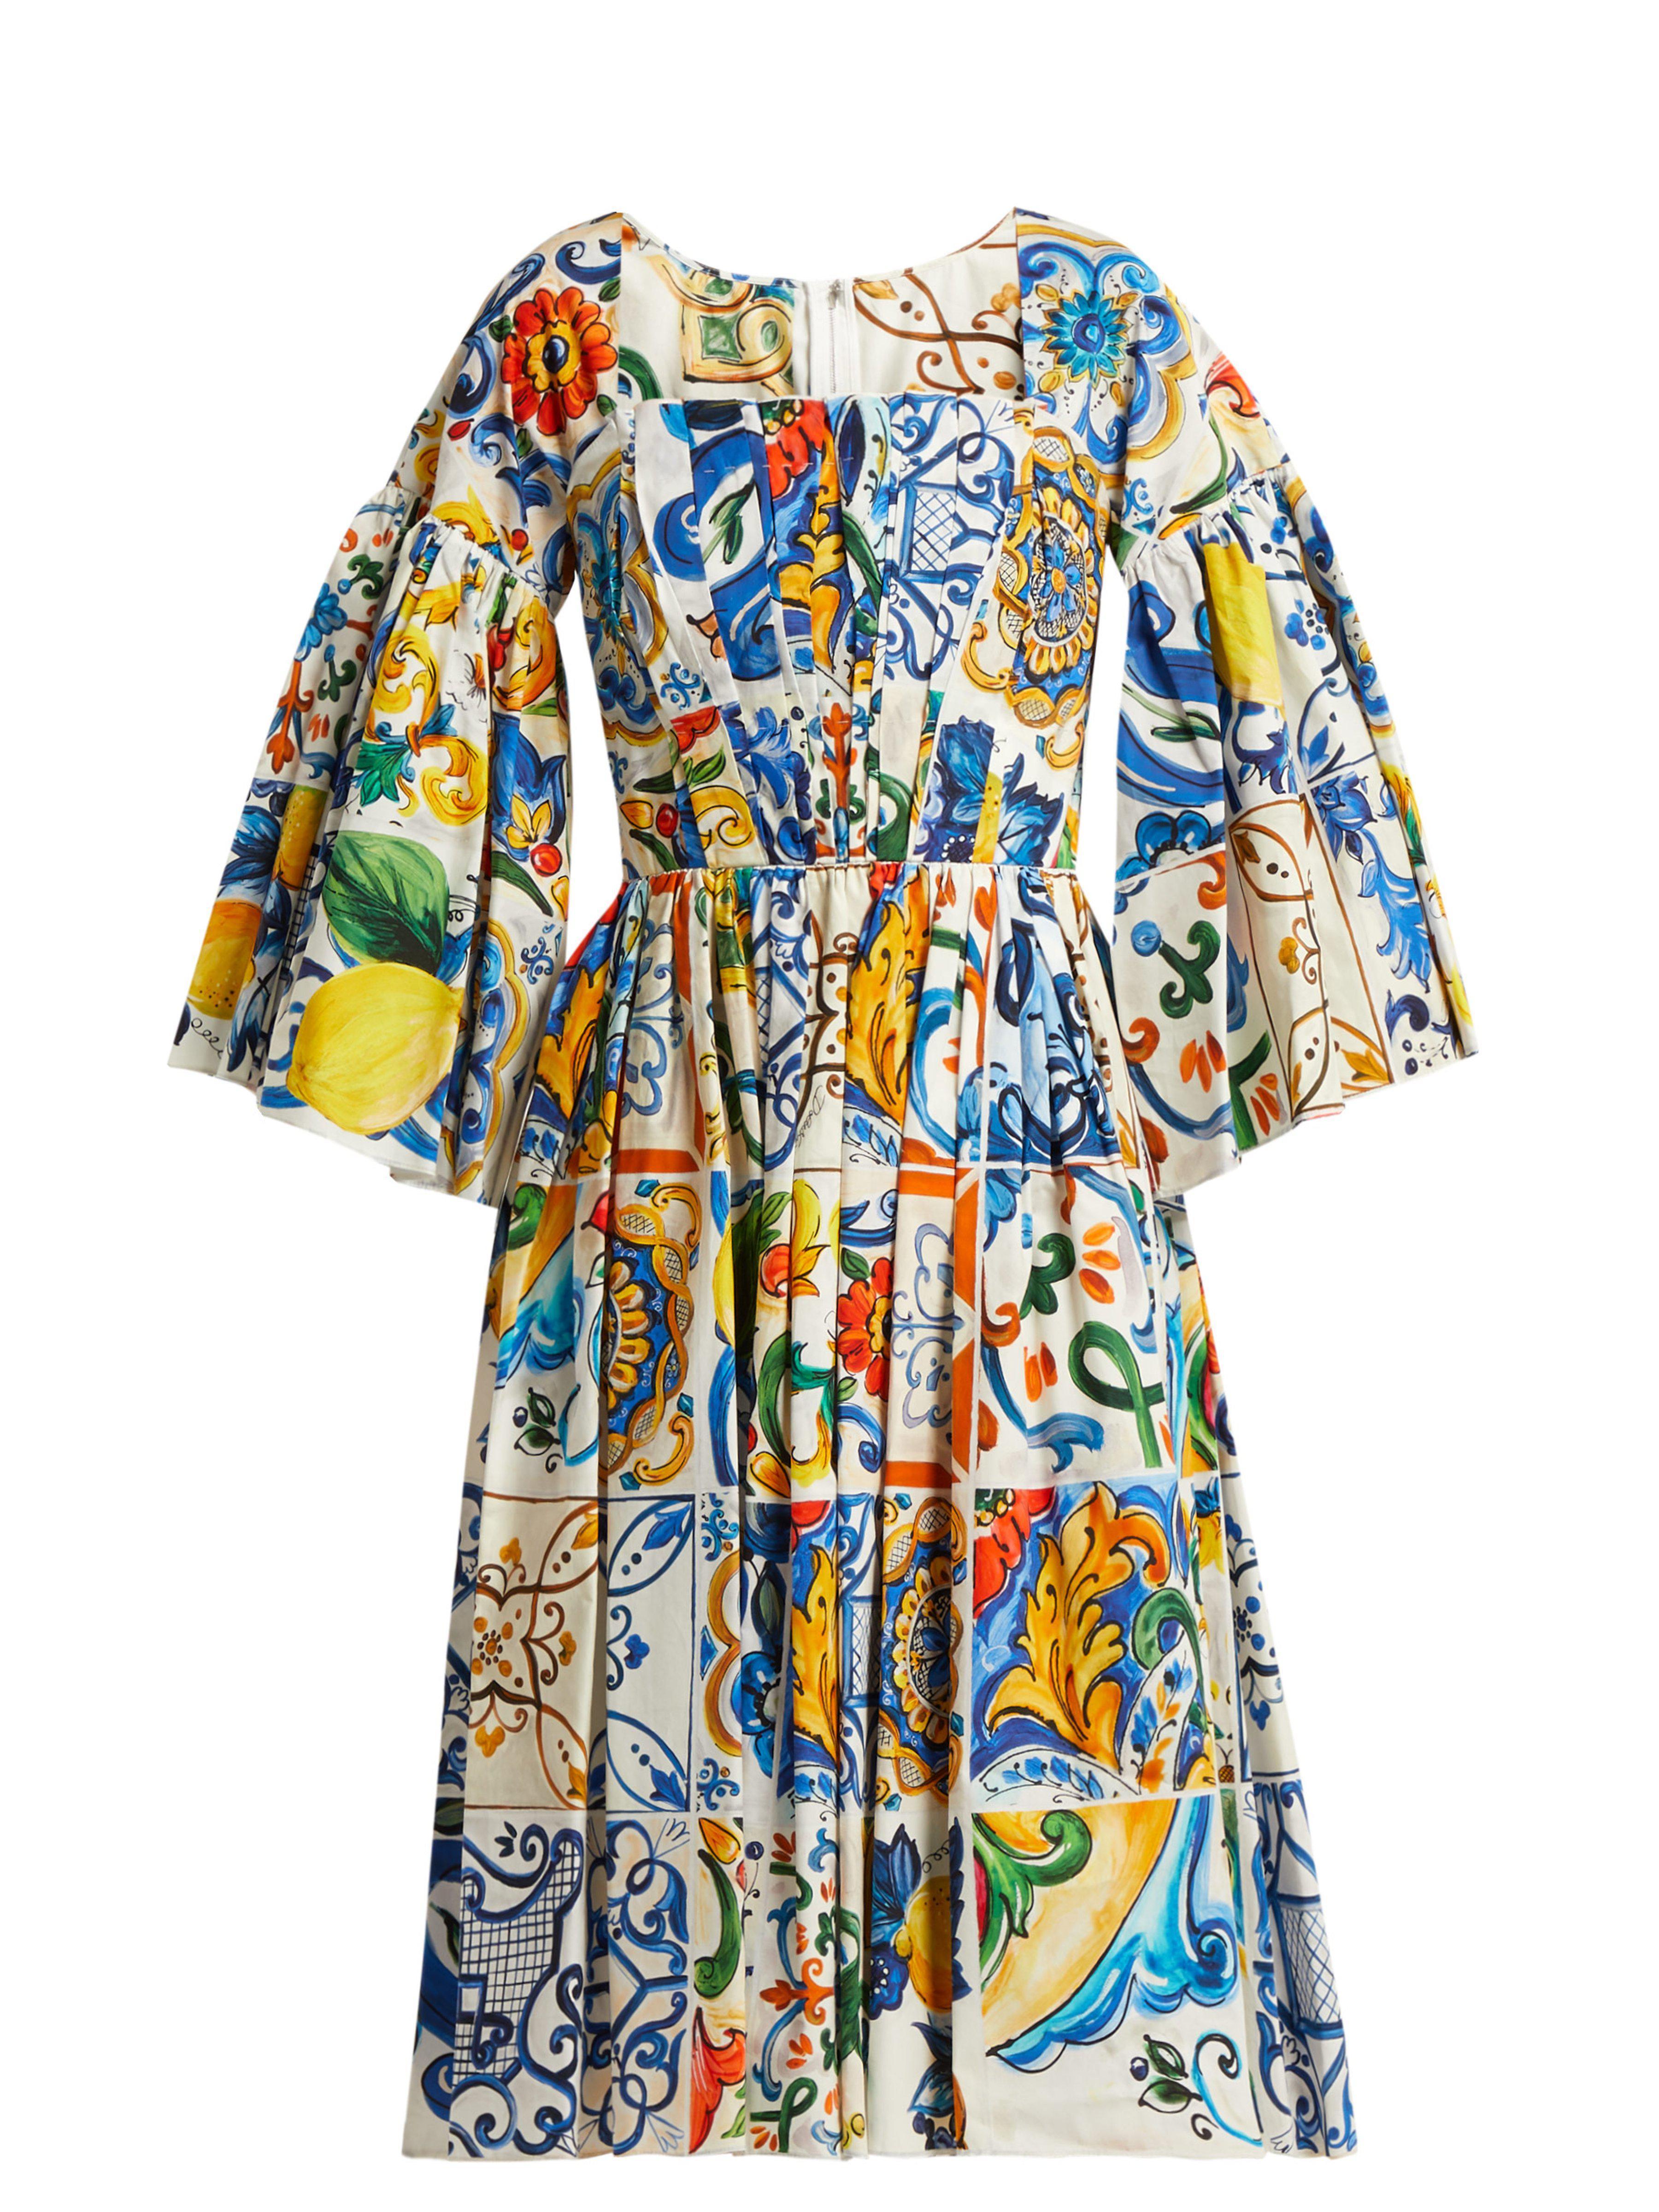 0abd5594c1a6 Dolce   Gabbana. Women s Blue Majolica Print Square Neck Cotton Poplin Dress